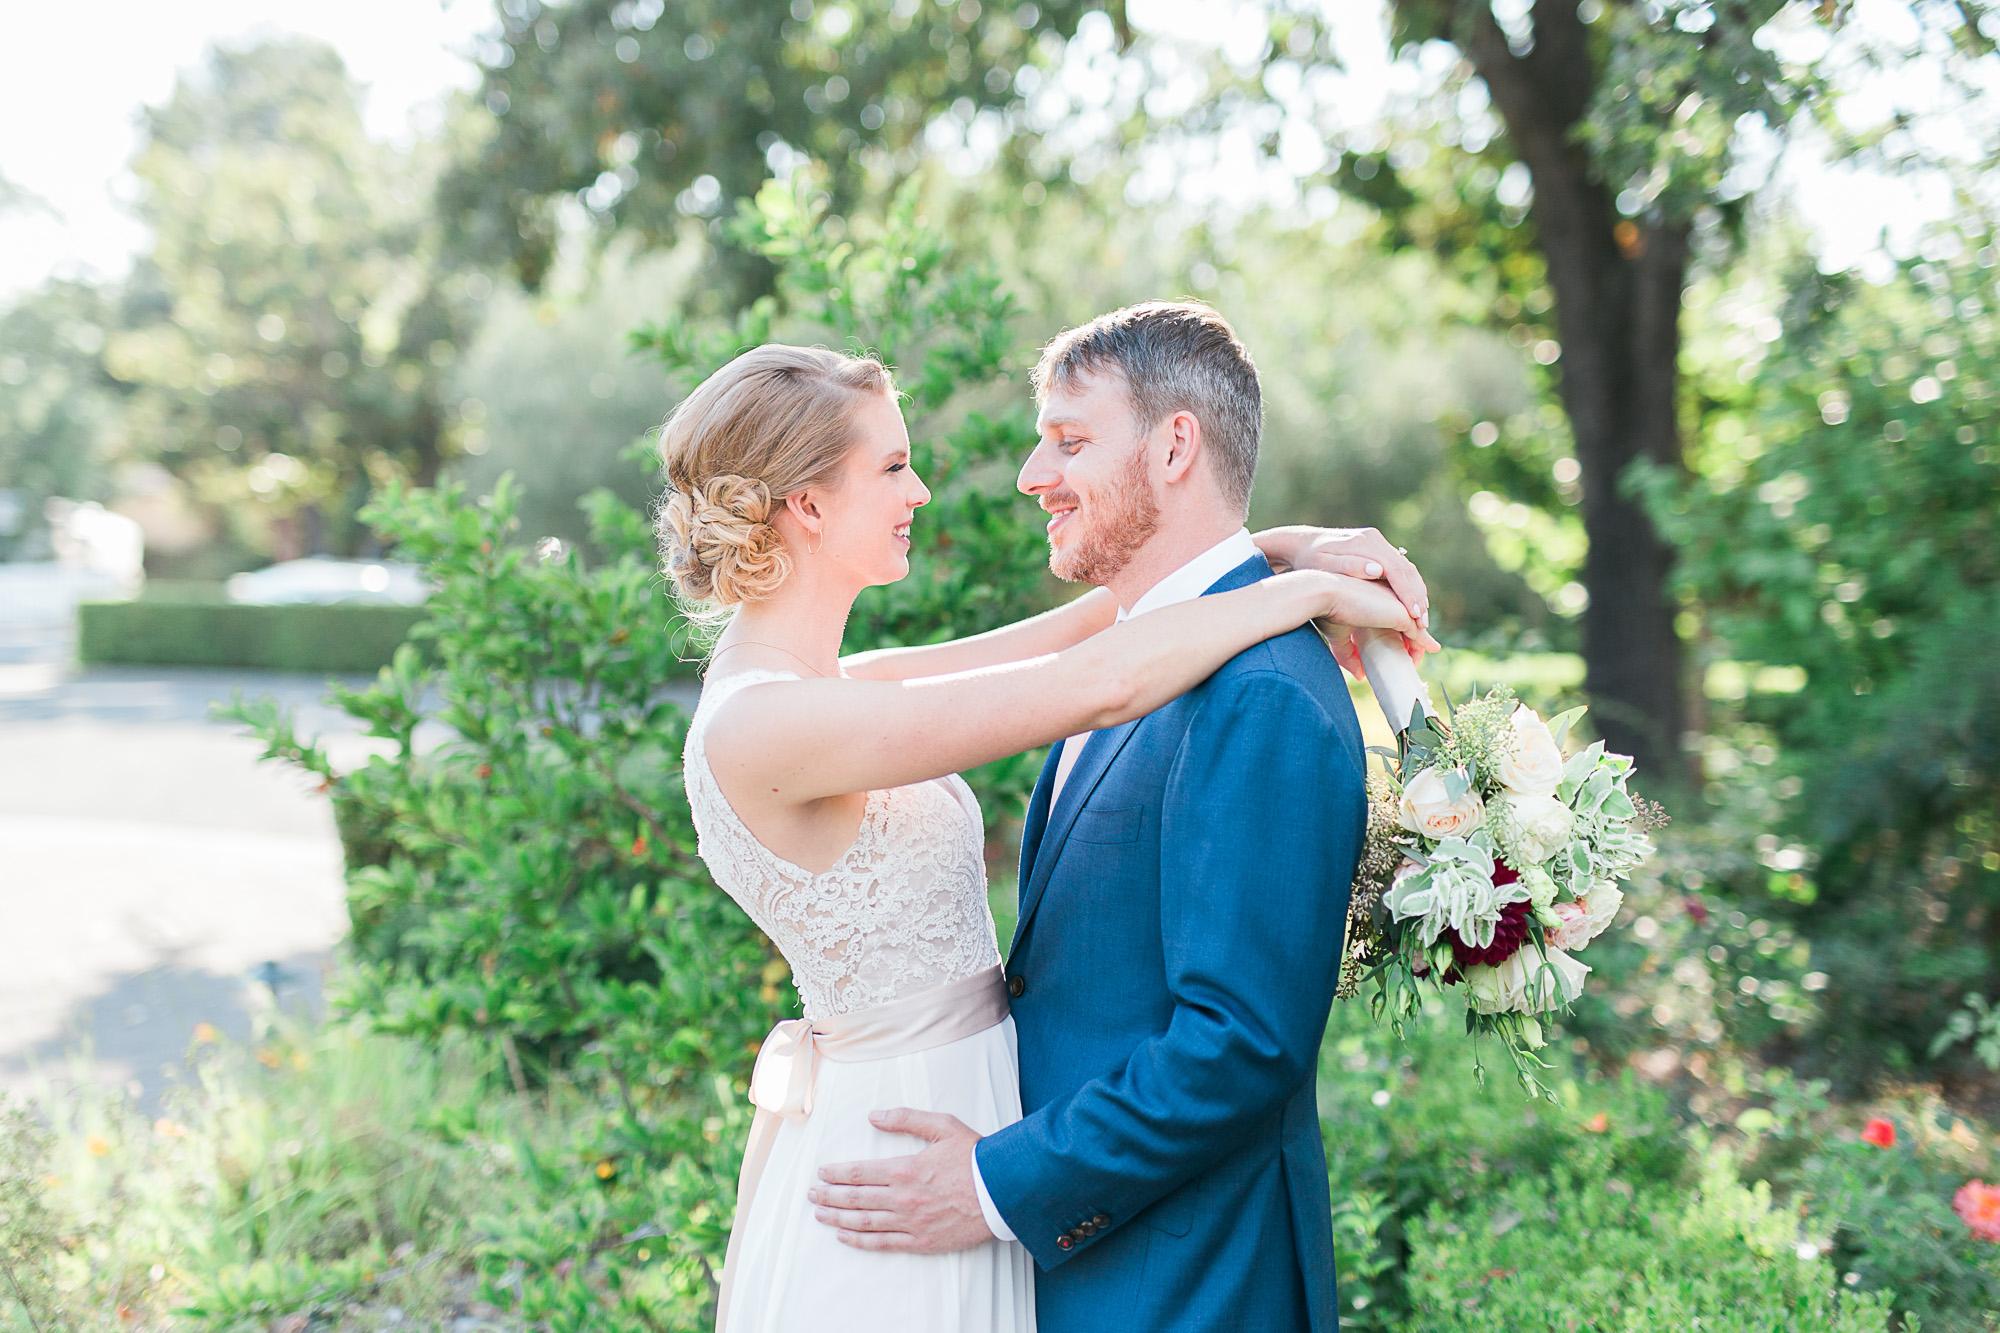 Generals Daughter Wedding Photos by JBJ Pictures - Ramekins Wedding Venue Photographer in Sonoma, Napa (13).jpg